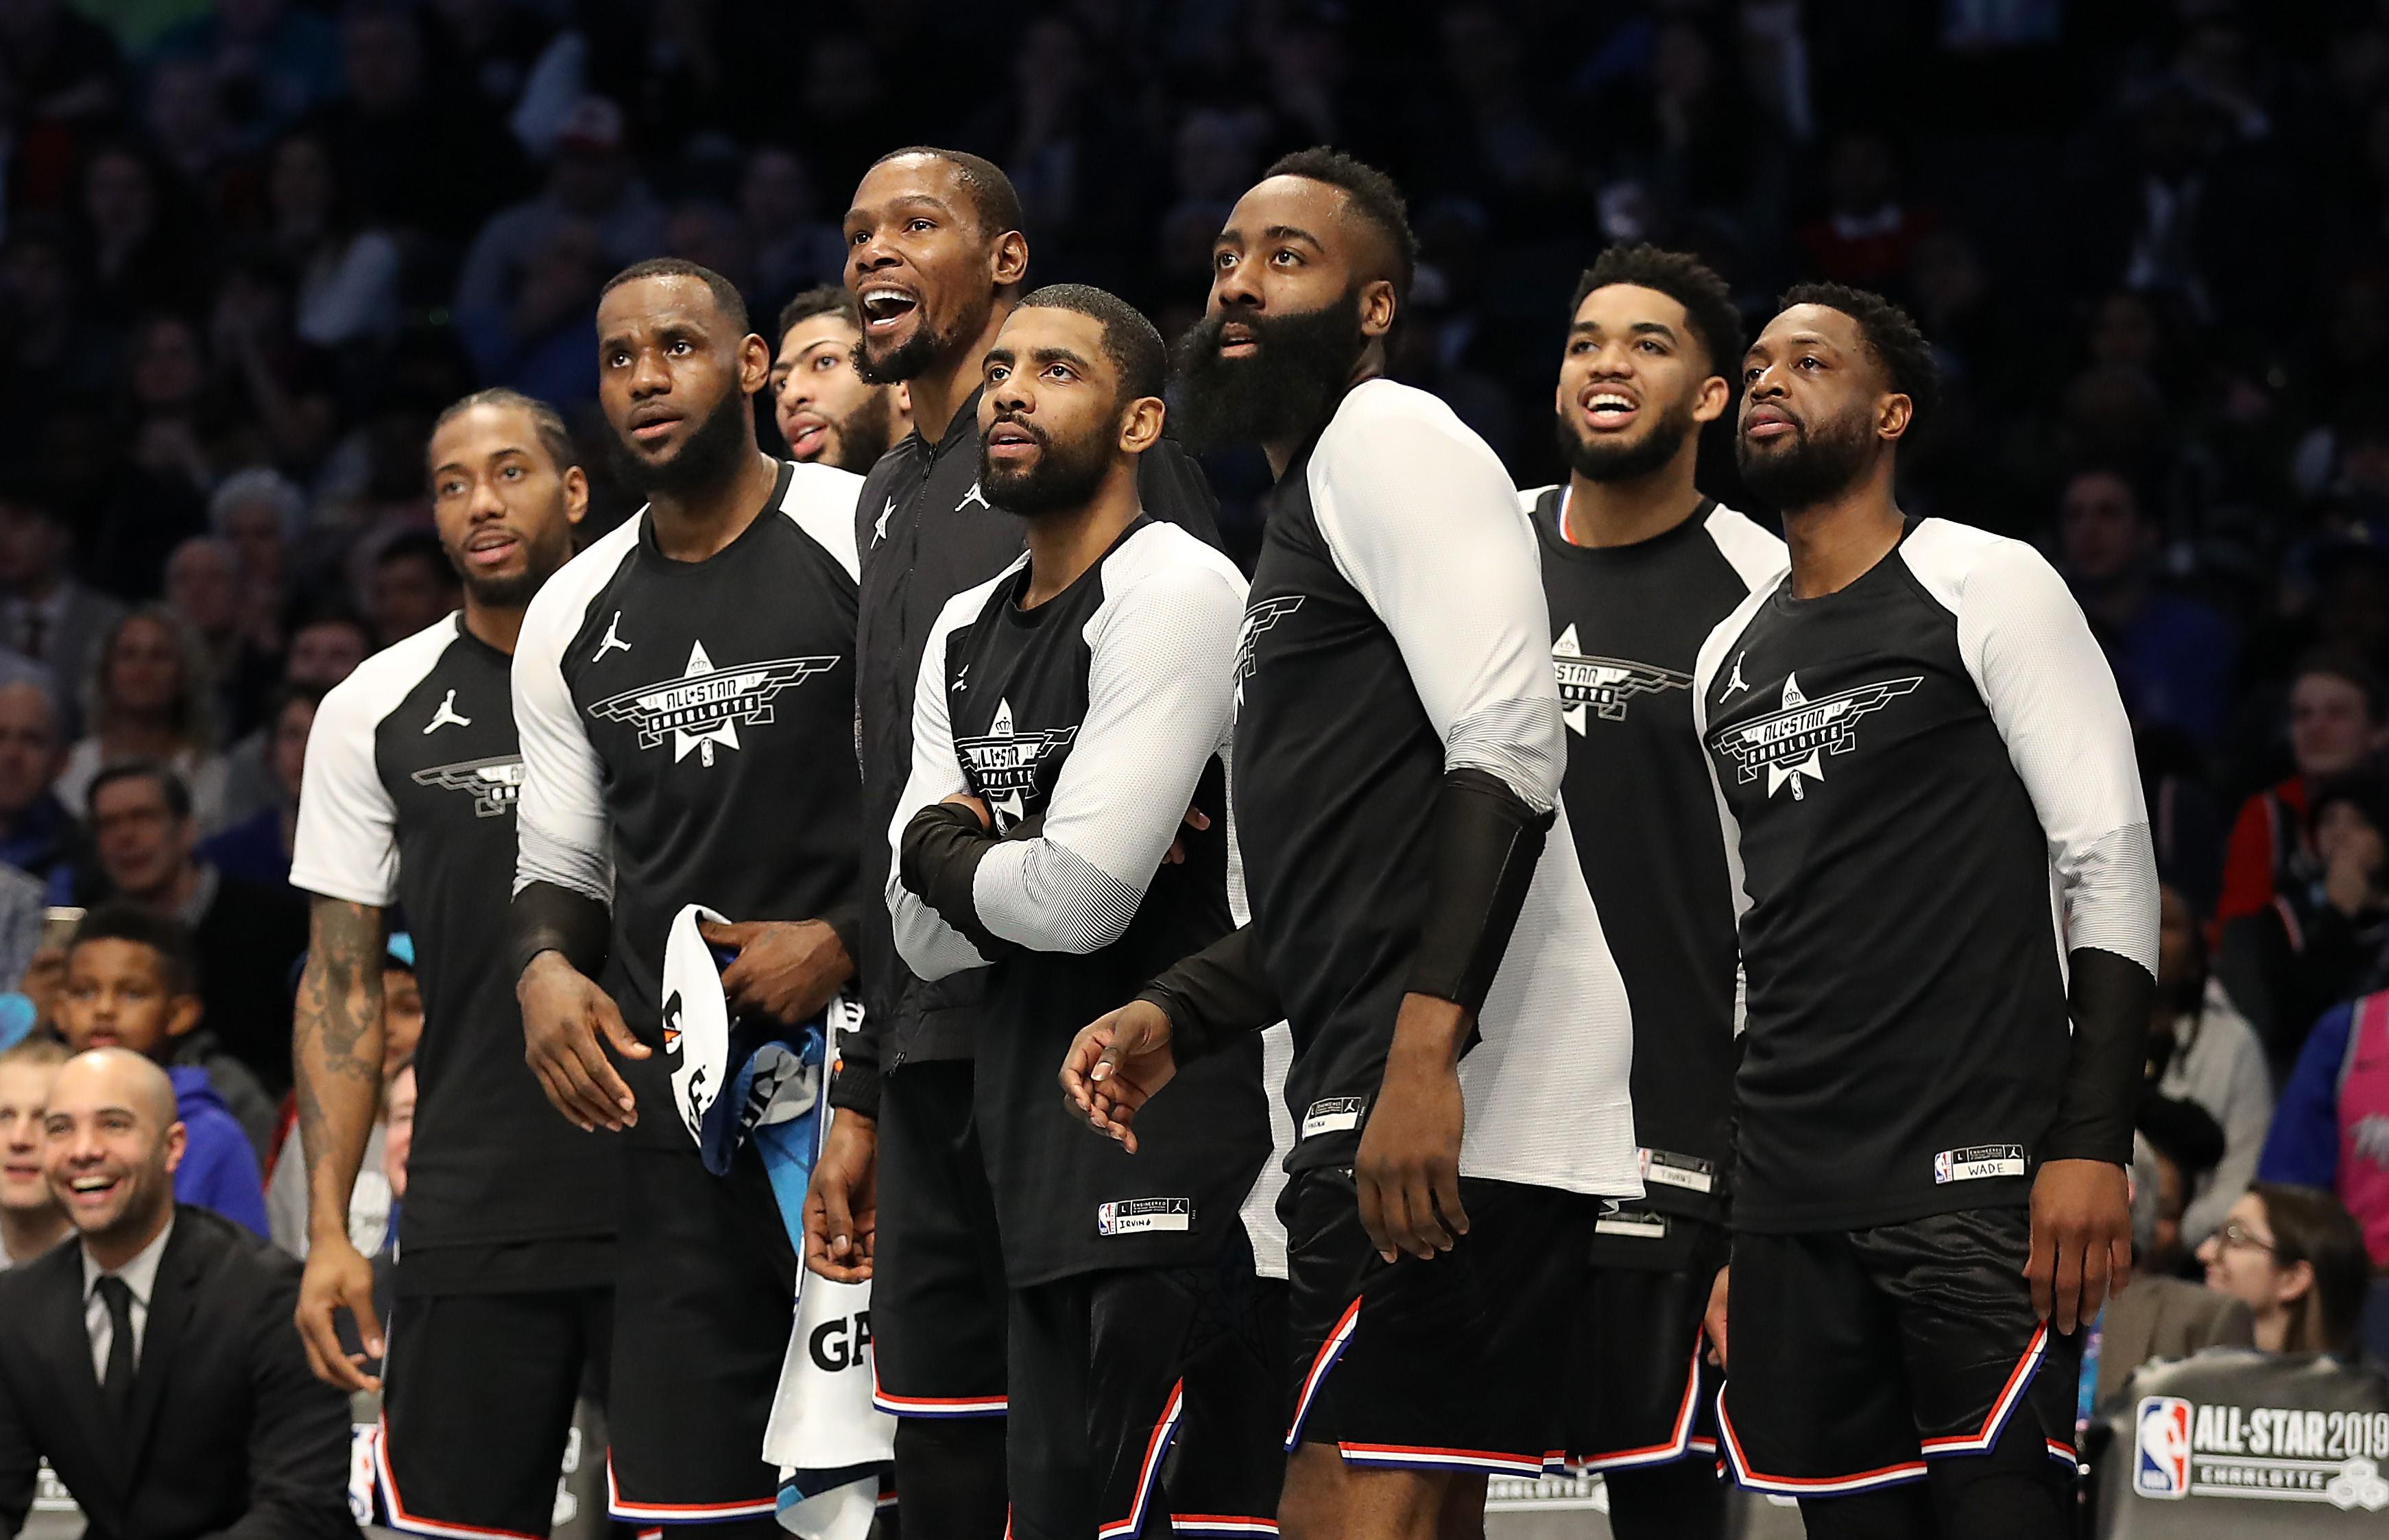 La Team LeBron James au All Star Game 2019